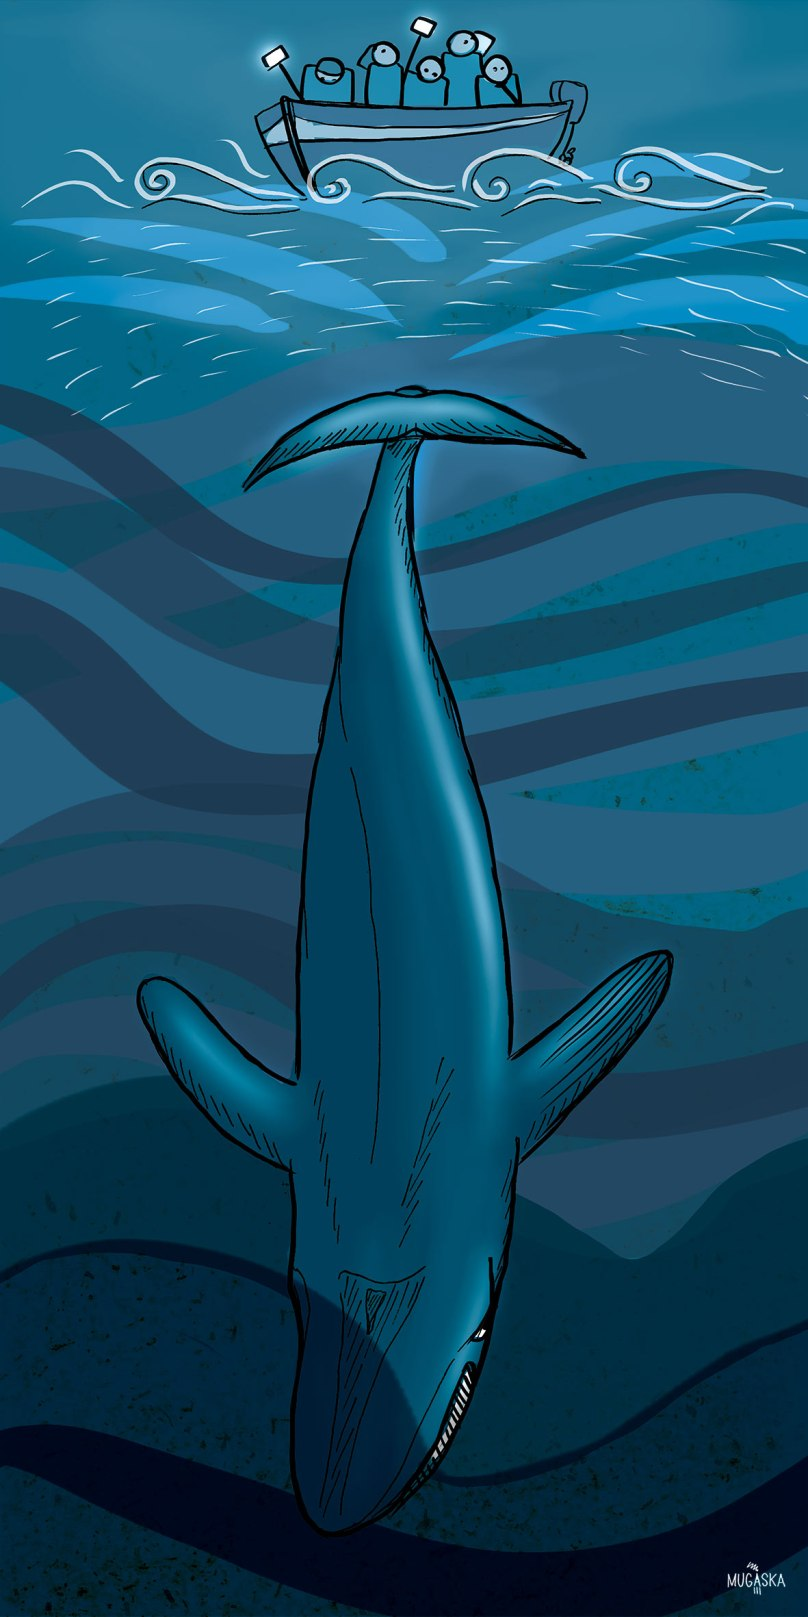 HIDDEN_whale_mugaska